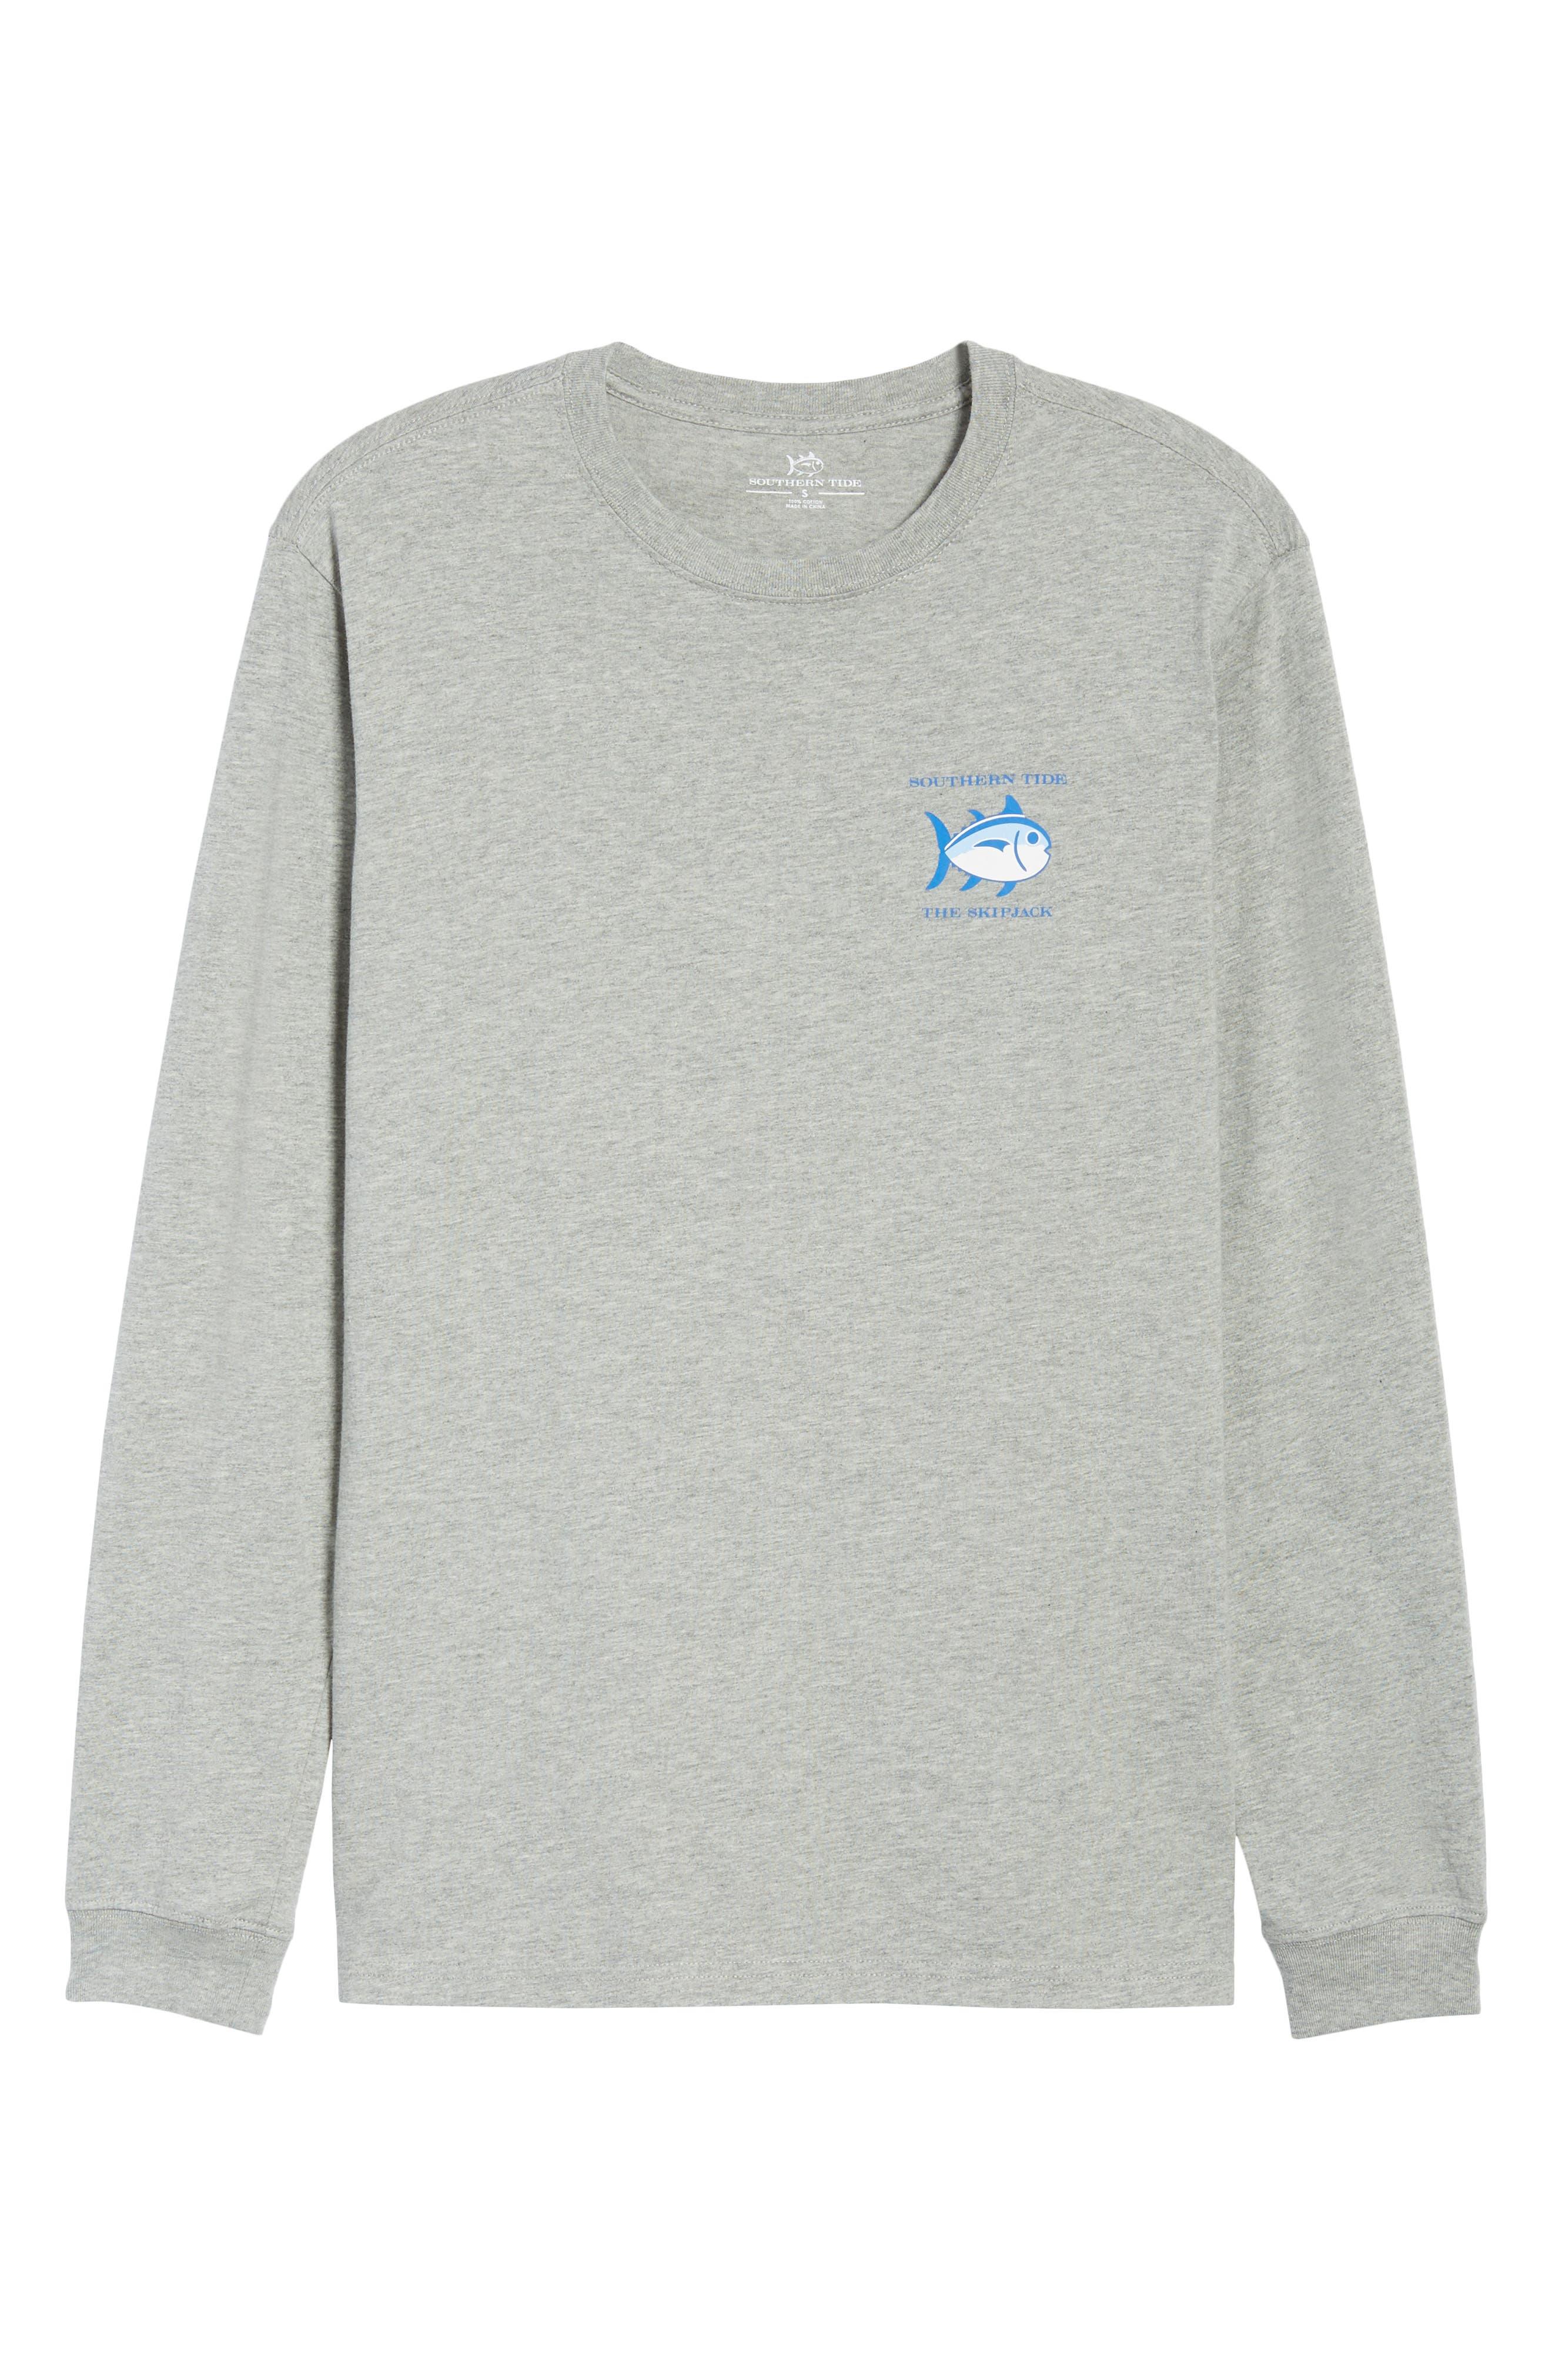 Original Skipjack T-Shirt,                             Alternate thumbnail 6, color,                             Grey